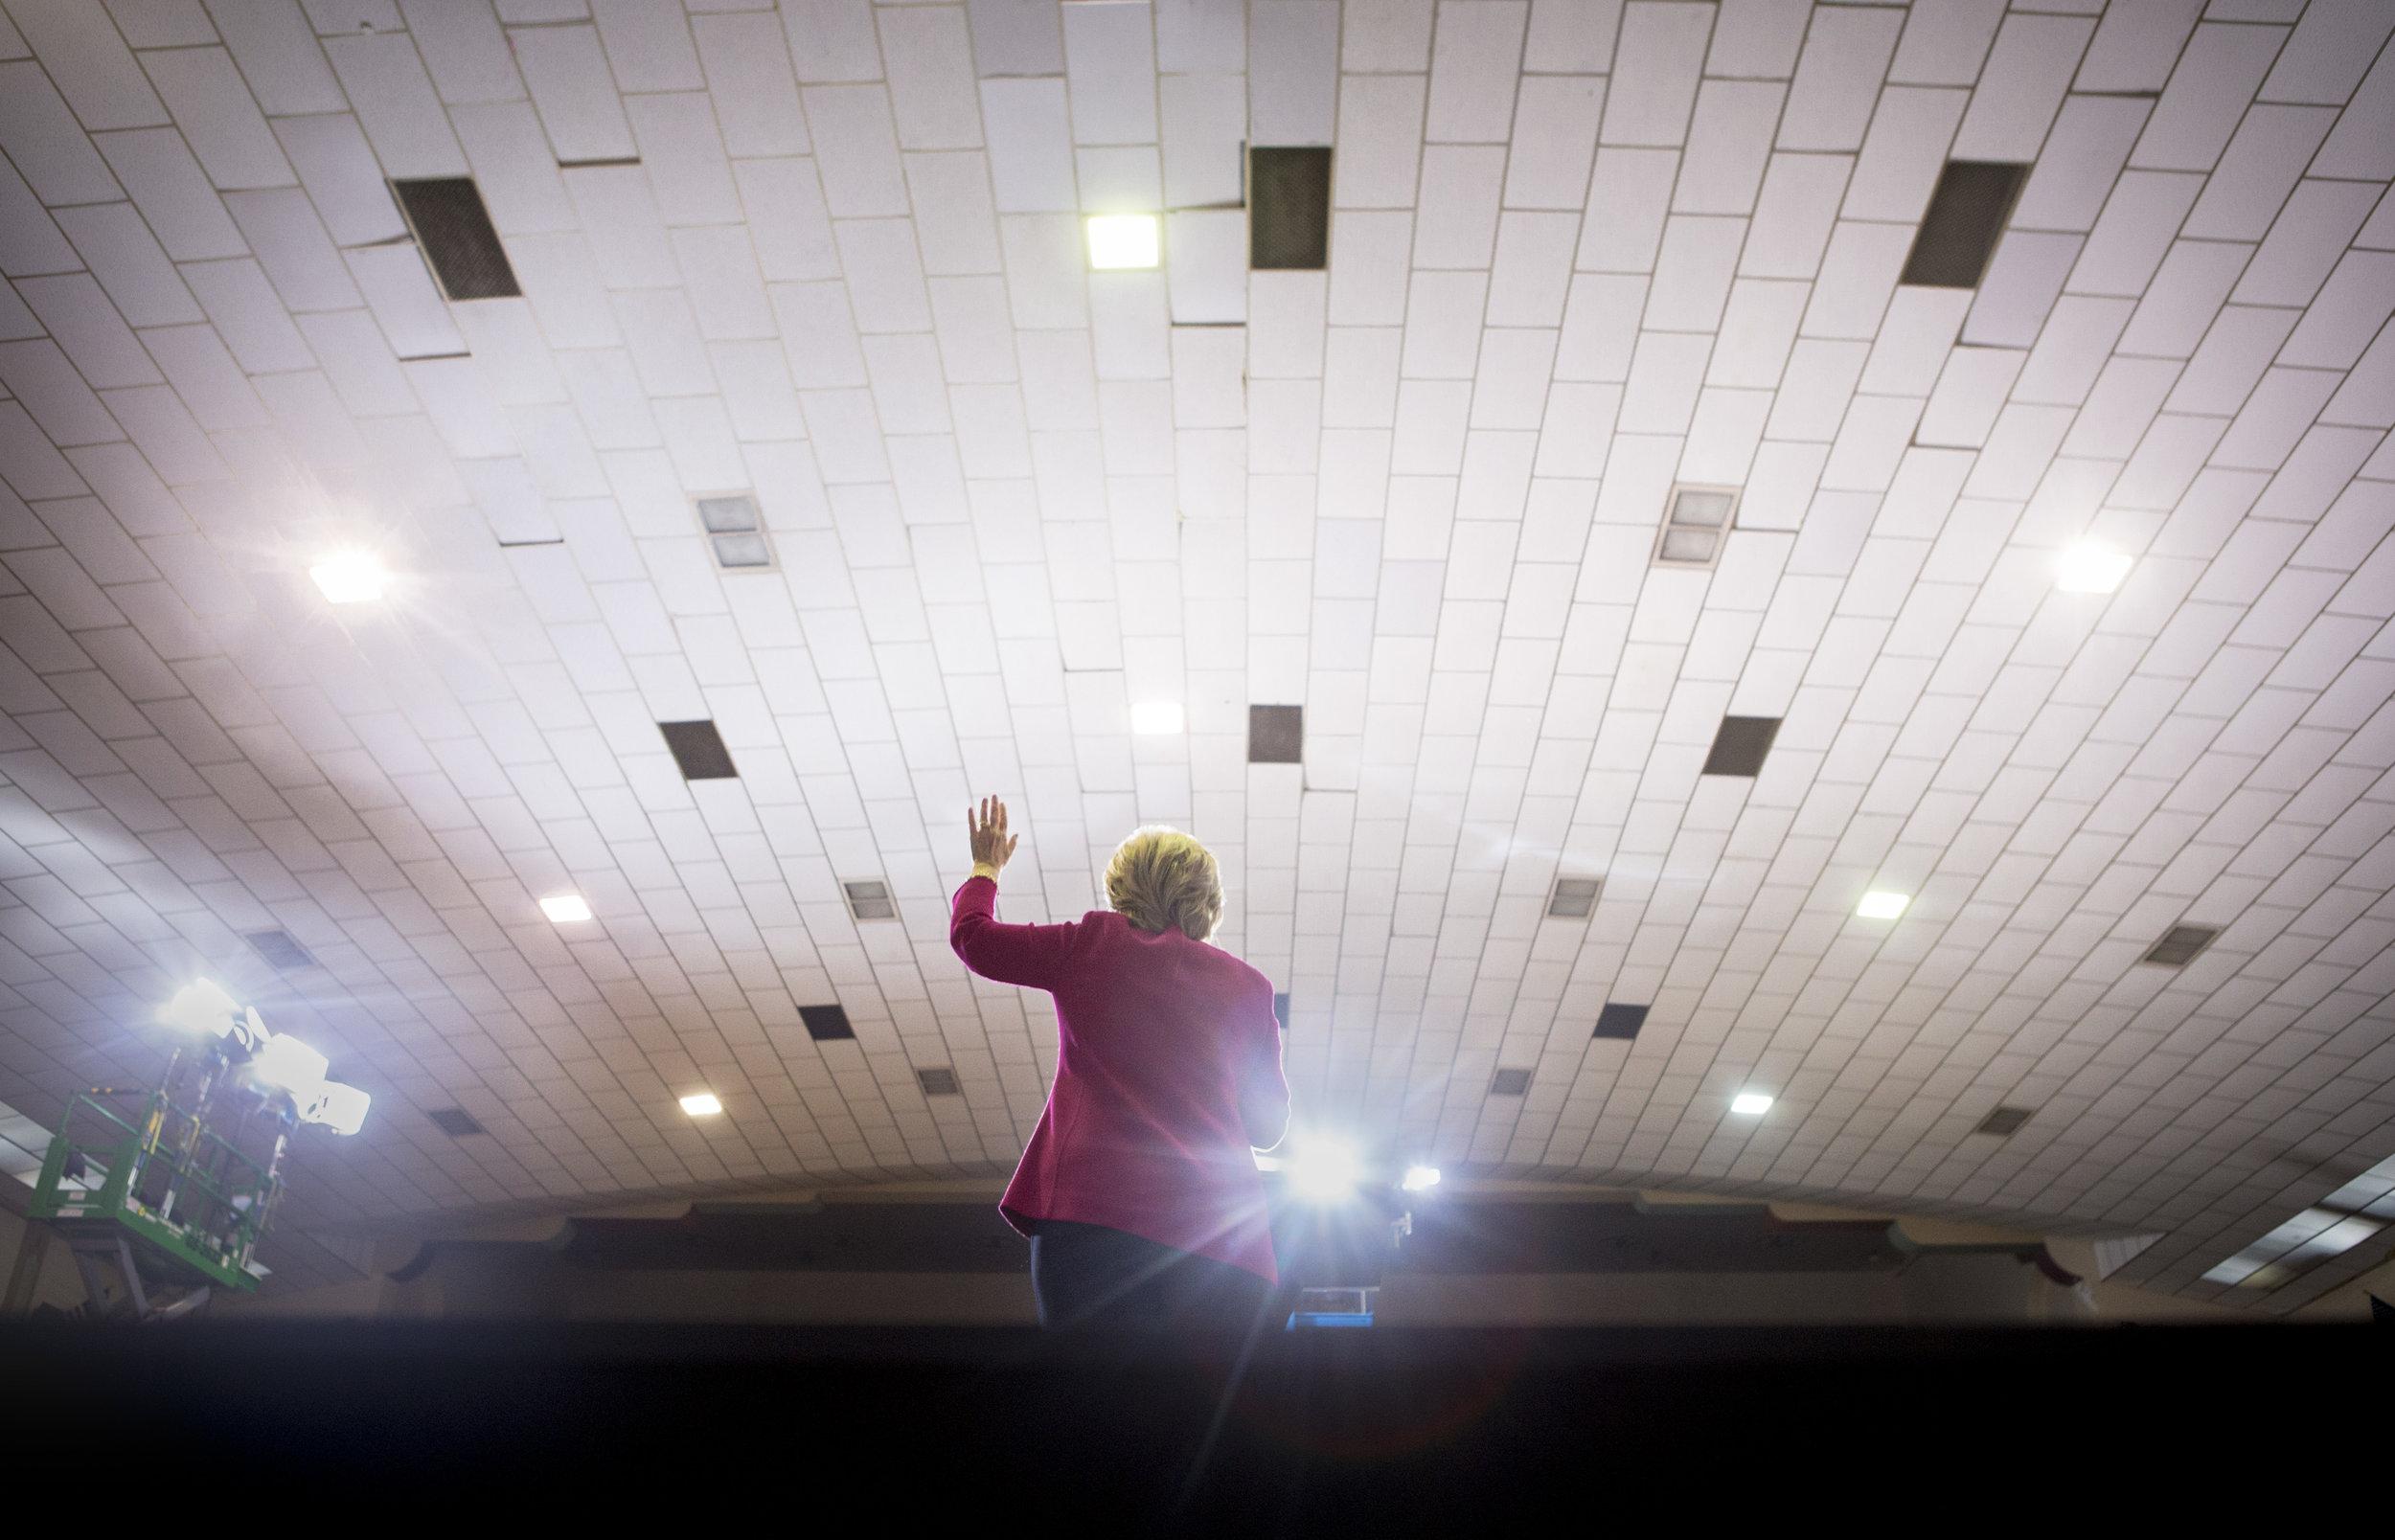 10042016_BJM_Hillary_Clinton_Campaigns_in_Harrisburg_Pennsylvania_02.jpg